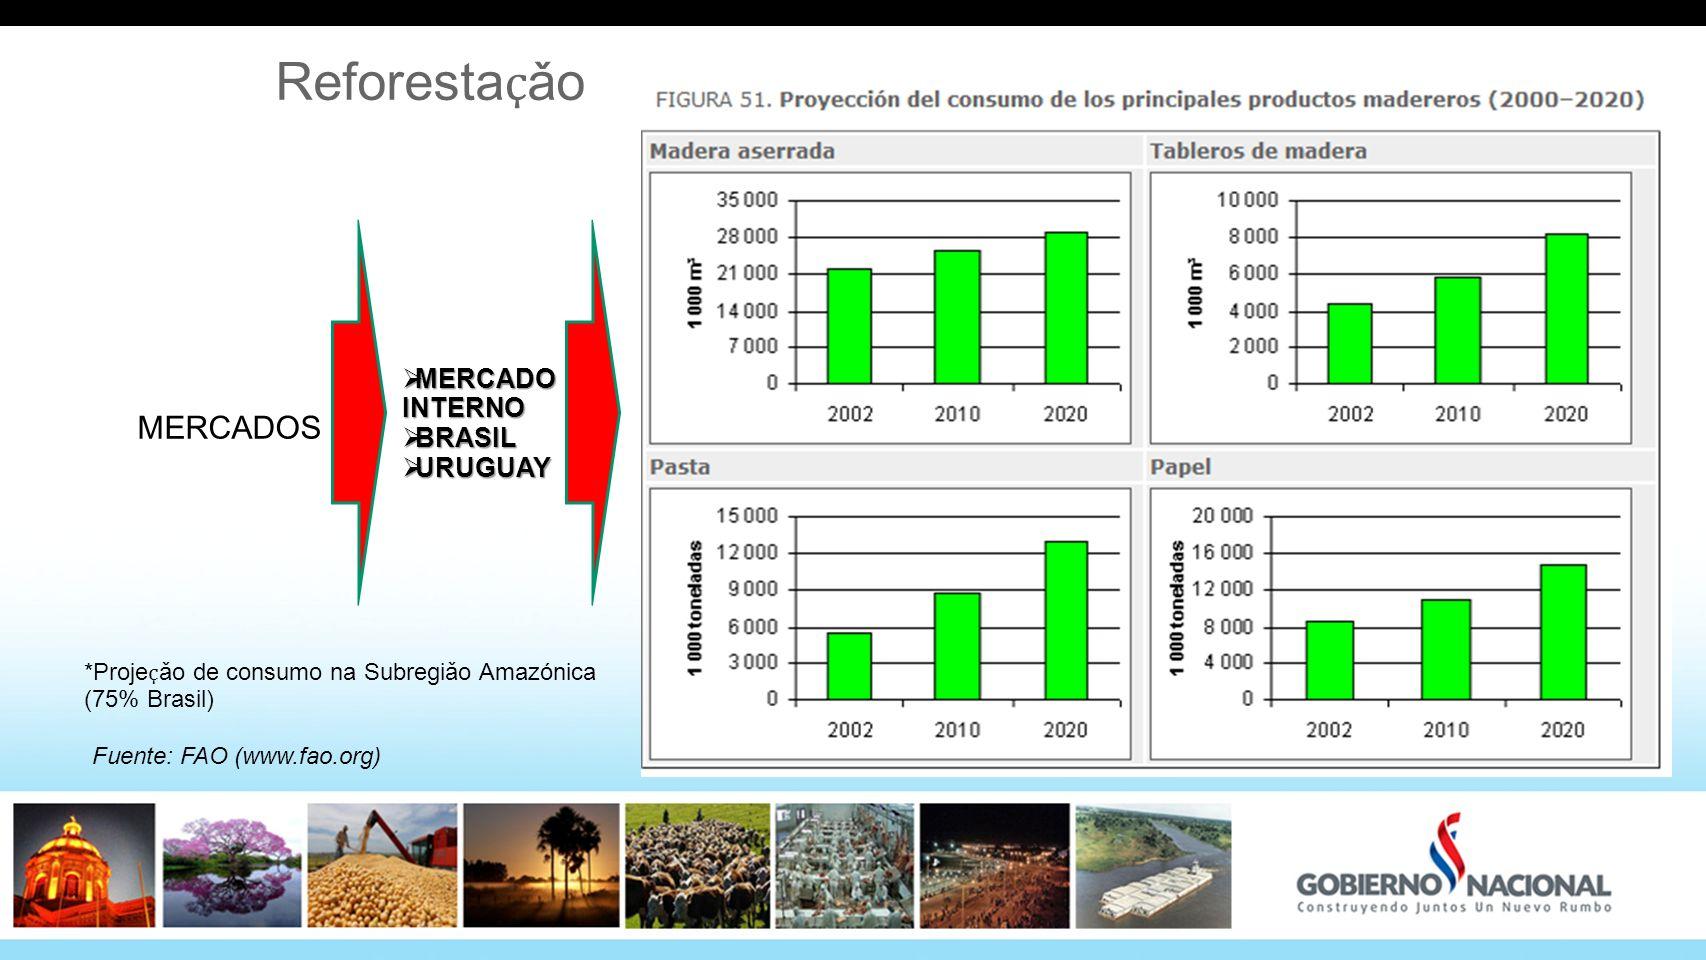 Reforestaҫǎo MERCADOS MERCADO INTERNO BRASIL URUGUAY